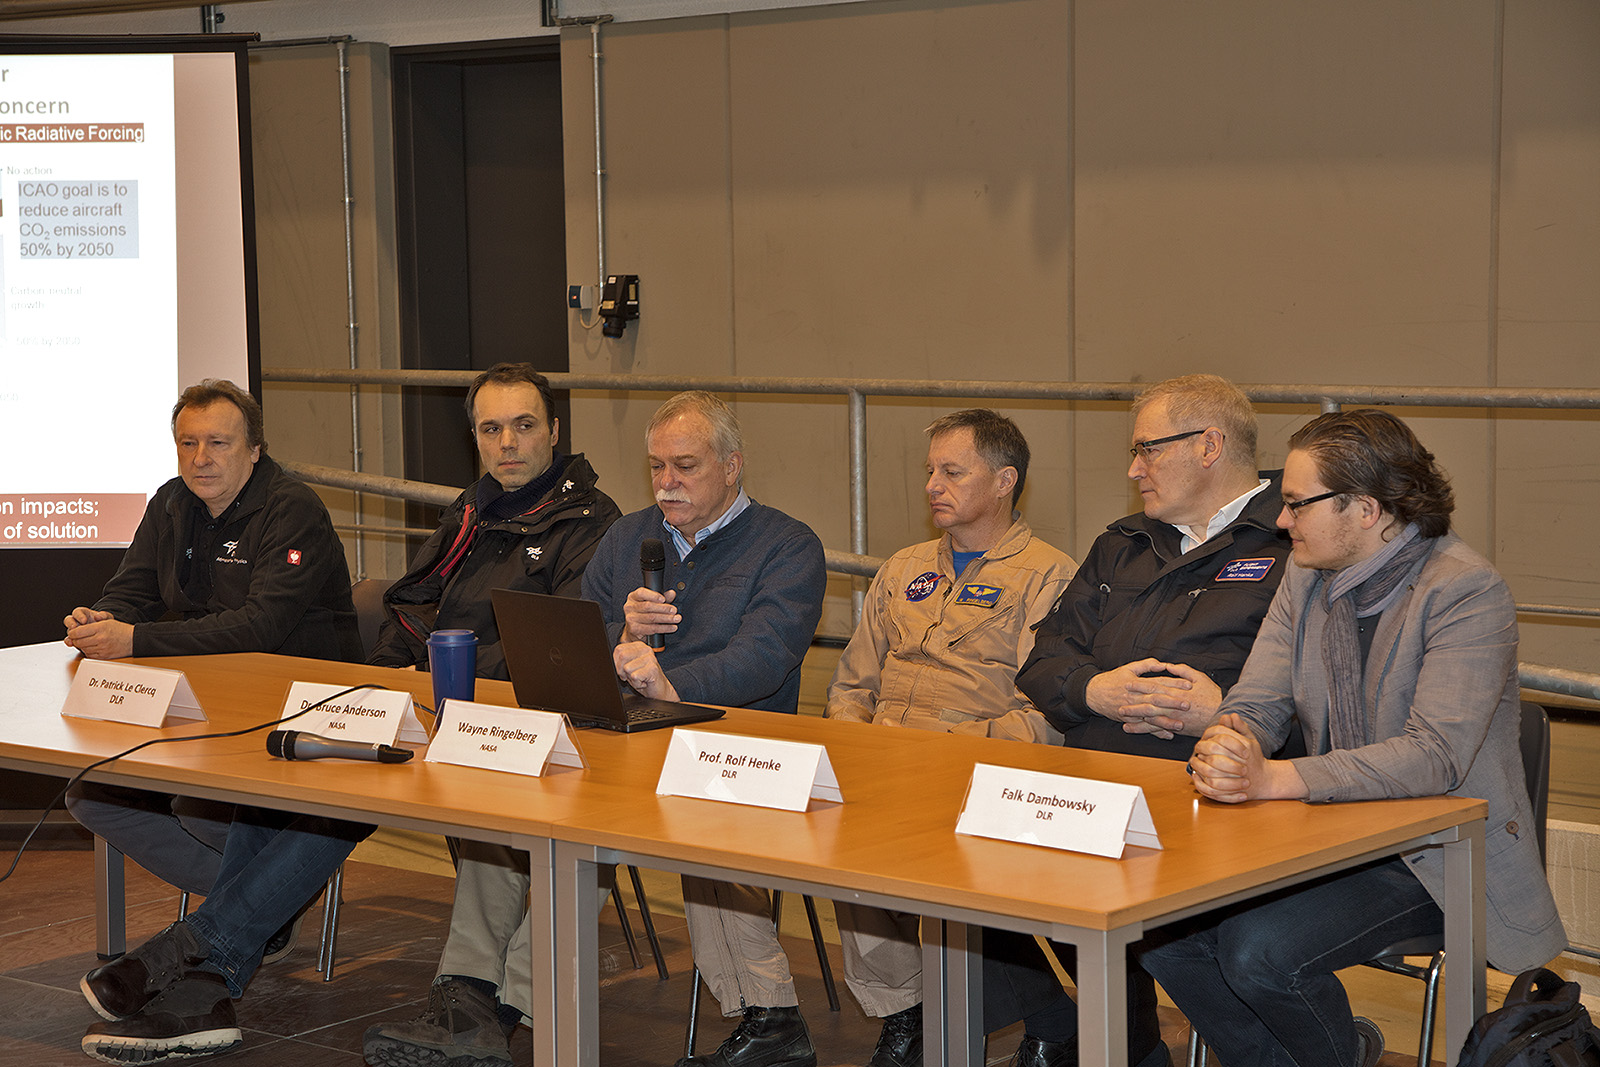 v.l.n.r.: Dr. Schlager (DLR), Dr. Le Clerq (DLR), Dr. Anderson (NASA), Pilot W. Ringelberg (NASA), Prof. Henke (DLR), F. Dambowsky (DLR)